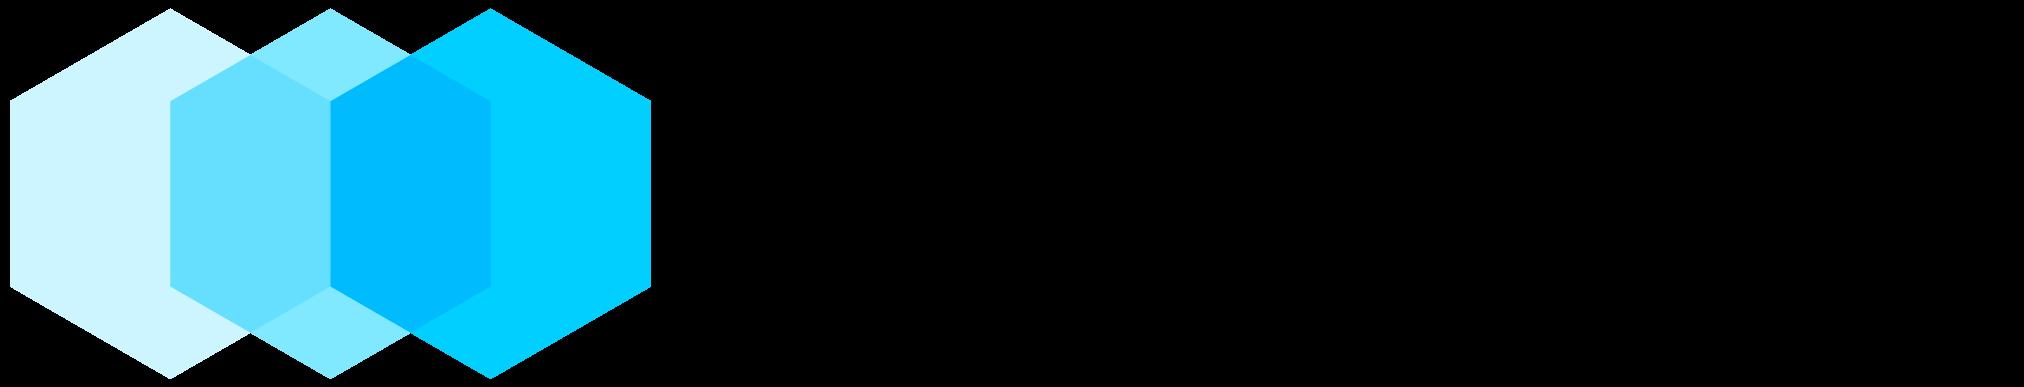 Vakanta-Horisontell-Svart-RGB.png